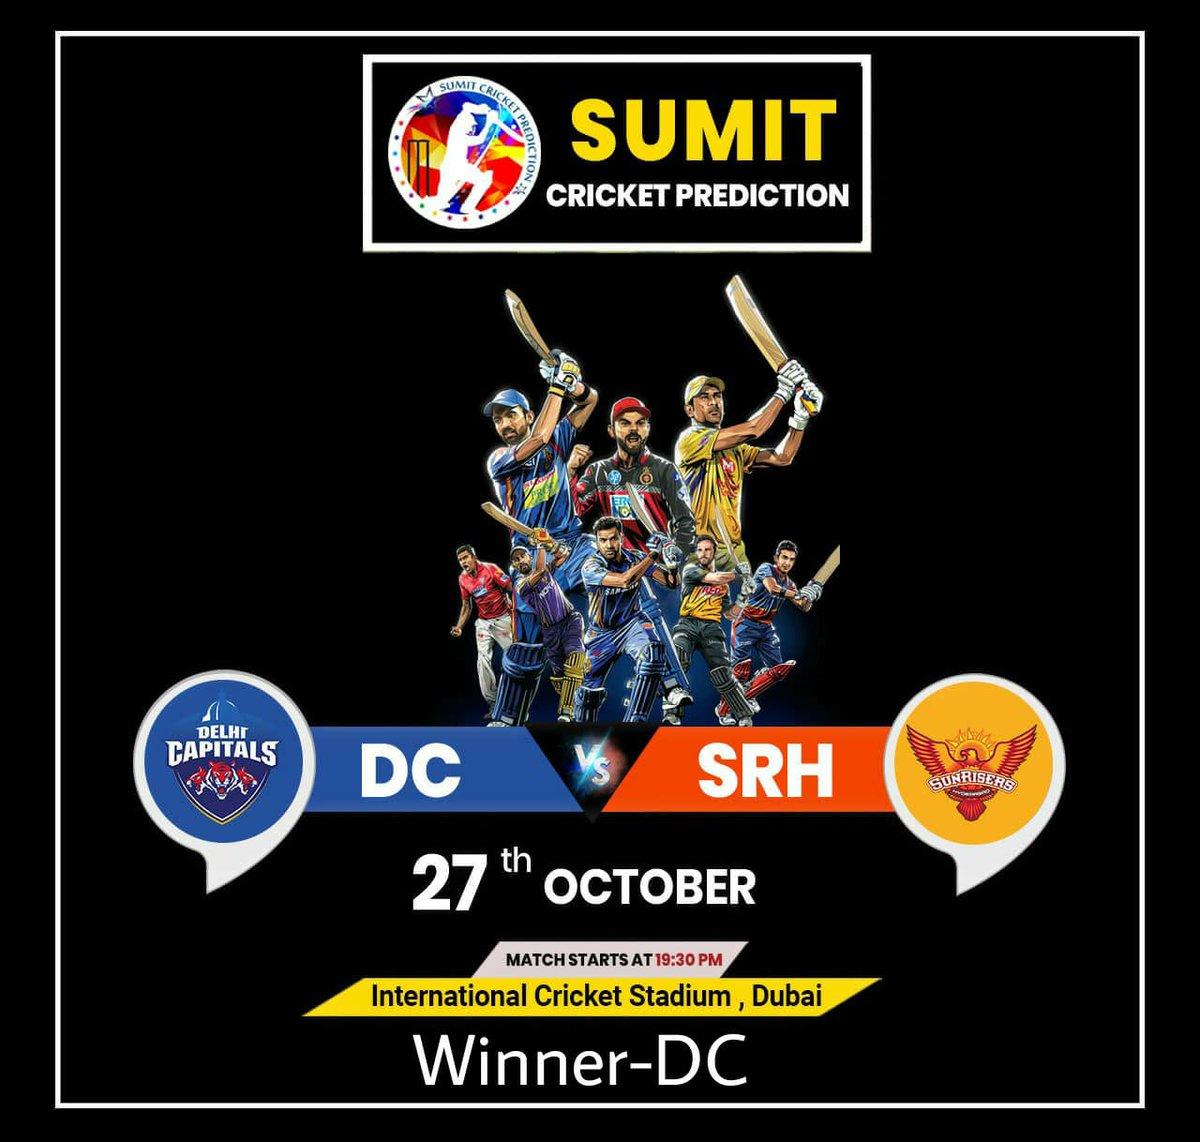 🏏   #IPL2020BigBlast 🏏  🏏 #DC Vs #SRH 🏏  ⚜️ Winner-#DC ⚜️   #IplT20 #Sumitprediction #Prediction #FreeTips #CricketPrediction  #IPL2020 #IPL  #TodayPrediction #BestTipper #CPL #Tipper  #FreeReport #CricketReport #MumbaiIndians #CKR #CSK #RR #KKR #DP #KXIP #SRH https://t.co/sPXOZ1cU5i